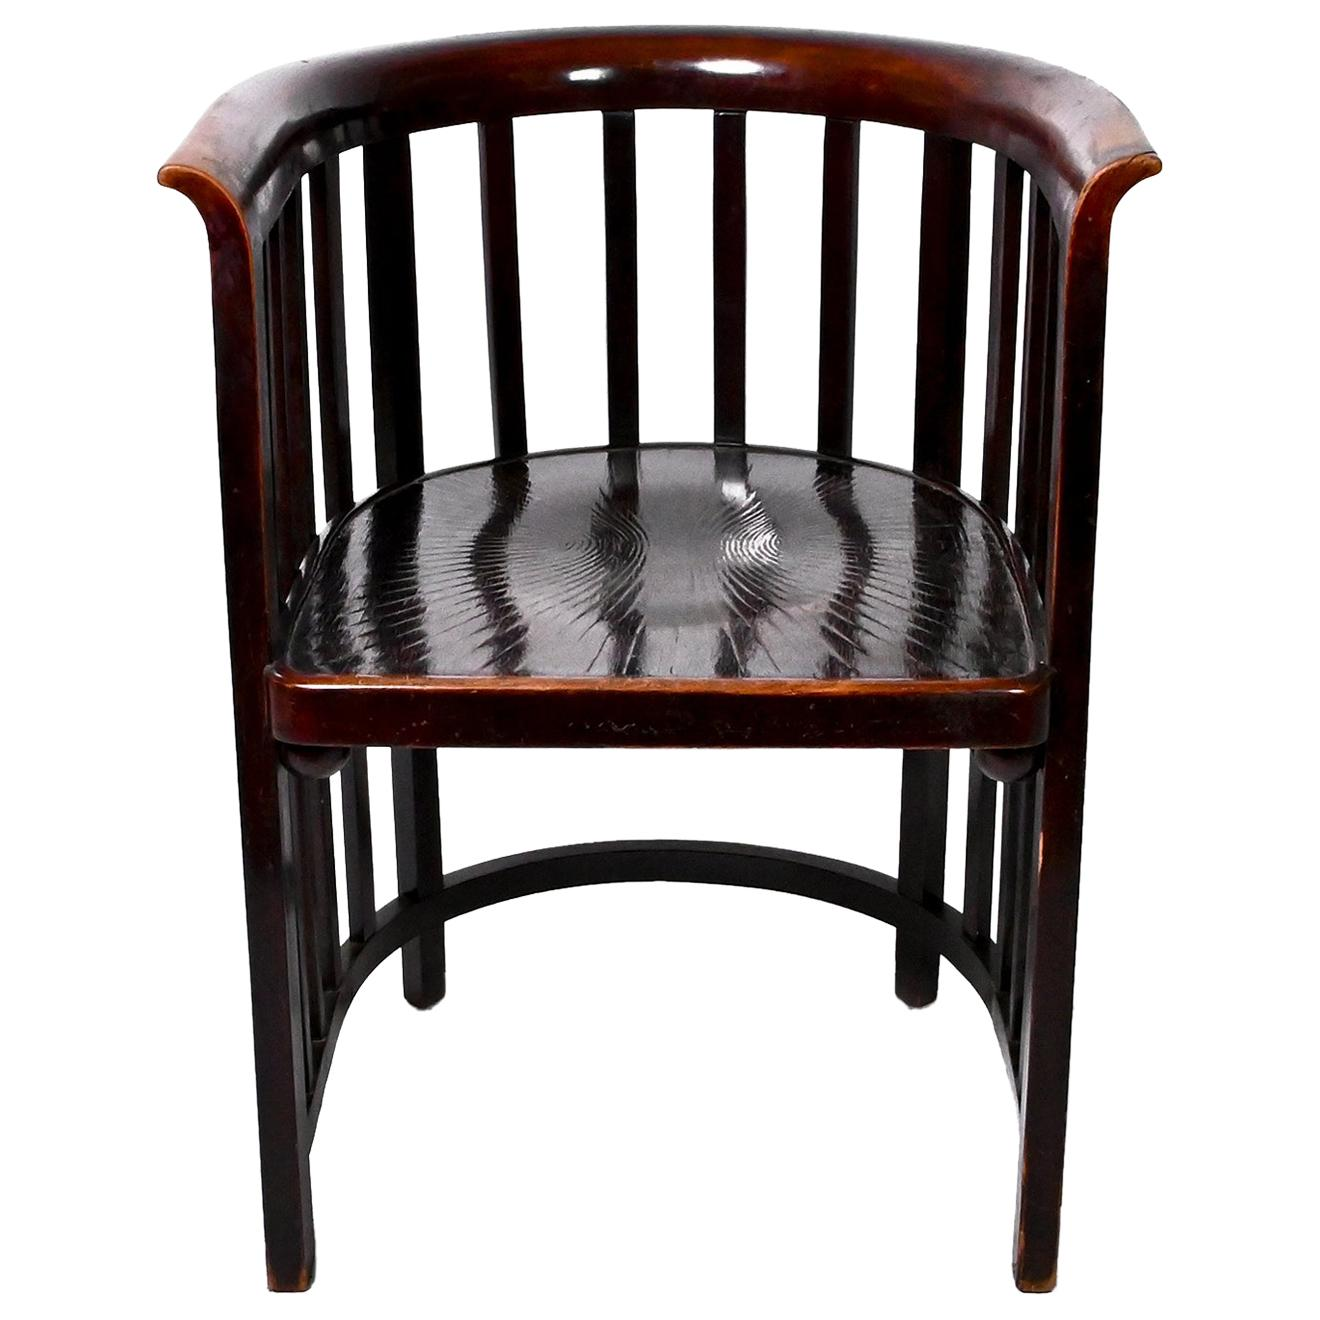 Antique Model 423/F Armchair by Josef Hoffmann for Jacob & Josef Kohn